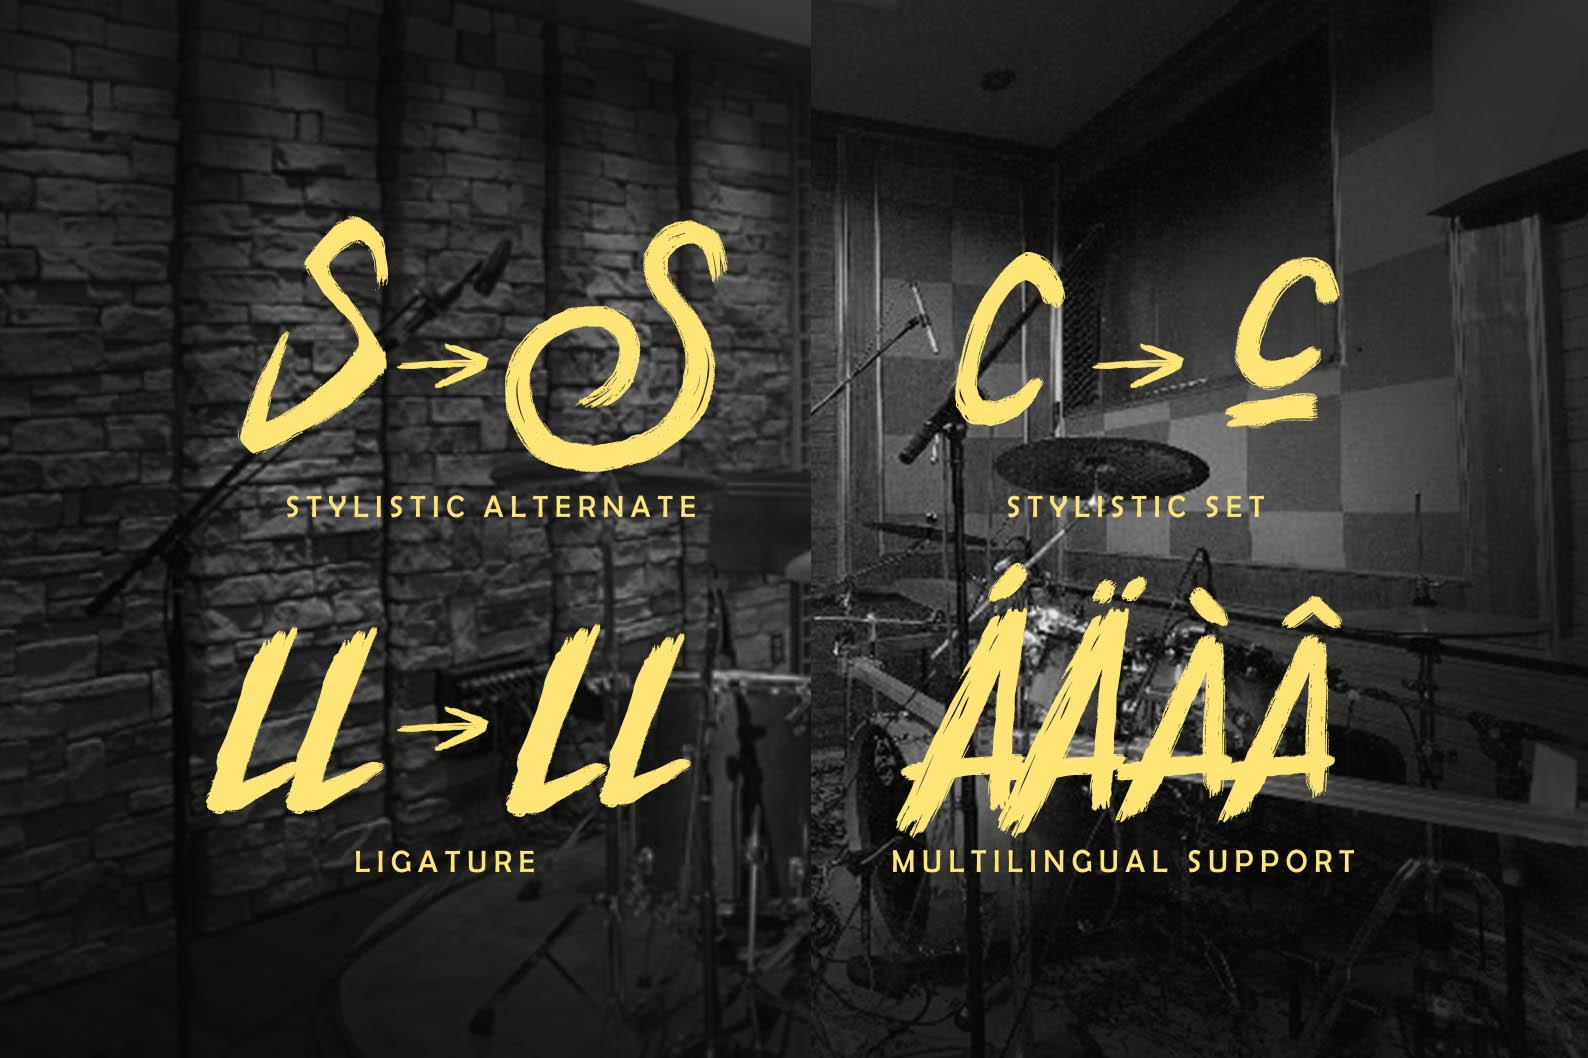 Stylistic Alternate. Stylistic Set. Ligature. Multilingual Support